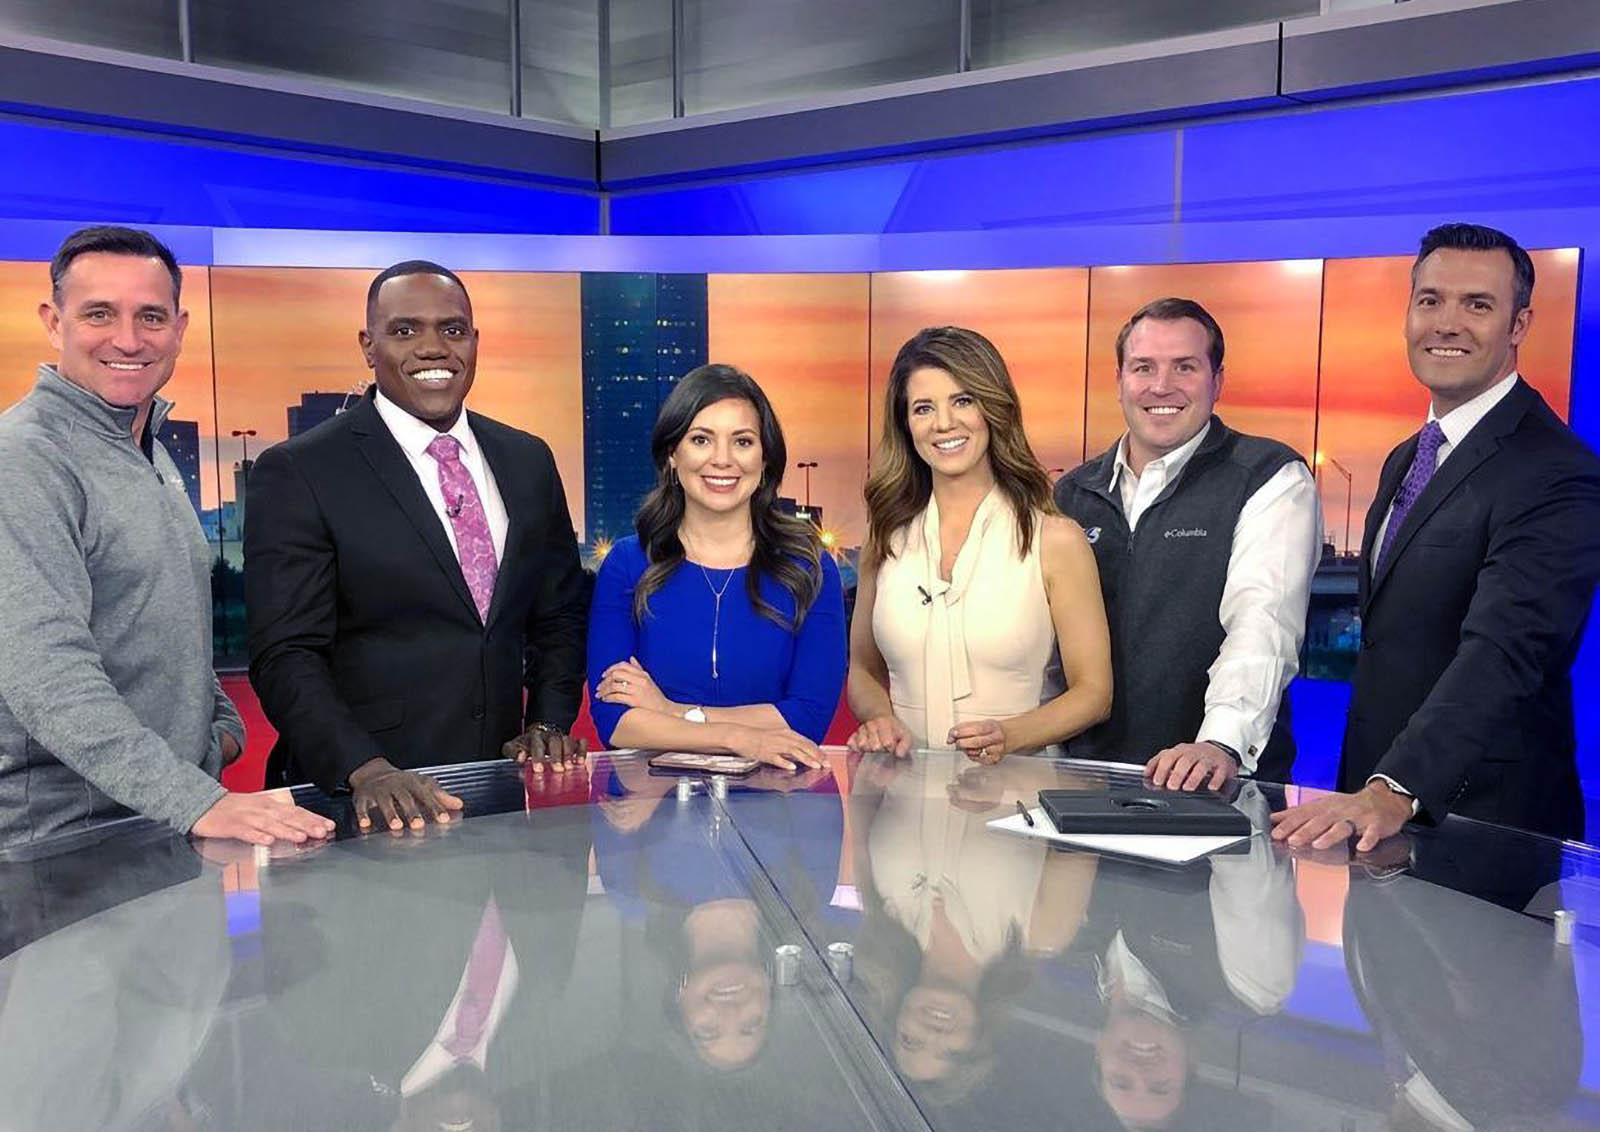 KOCO 5 News Newscasters